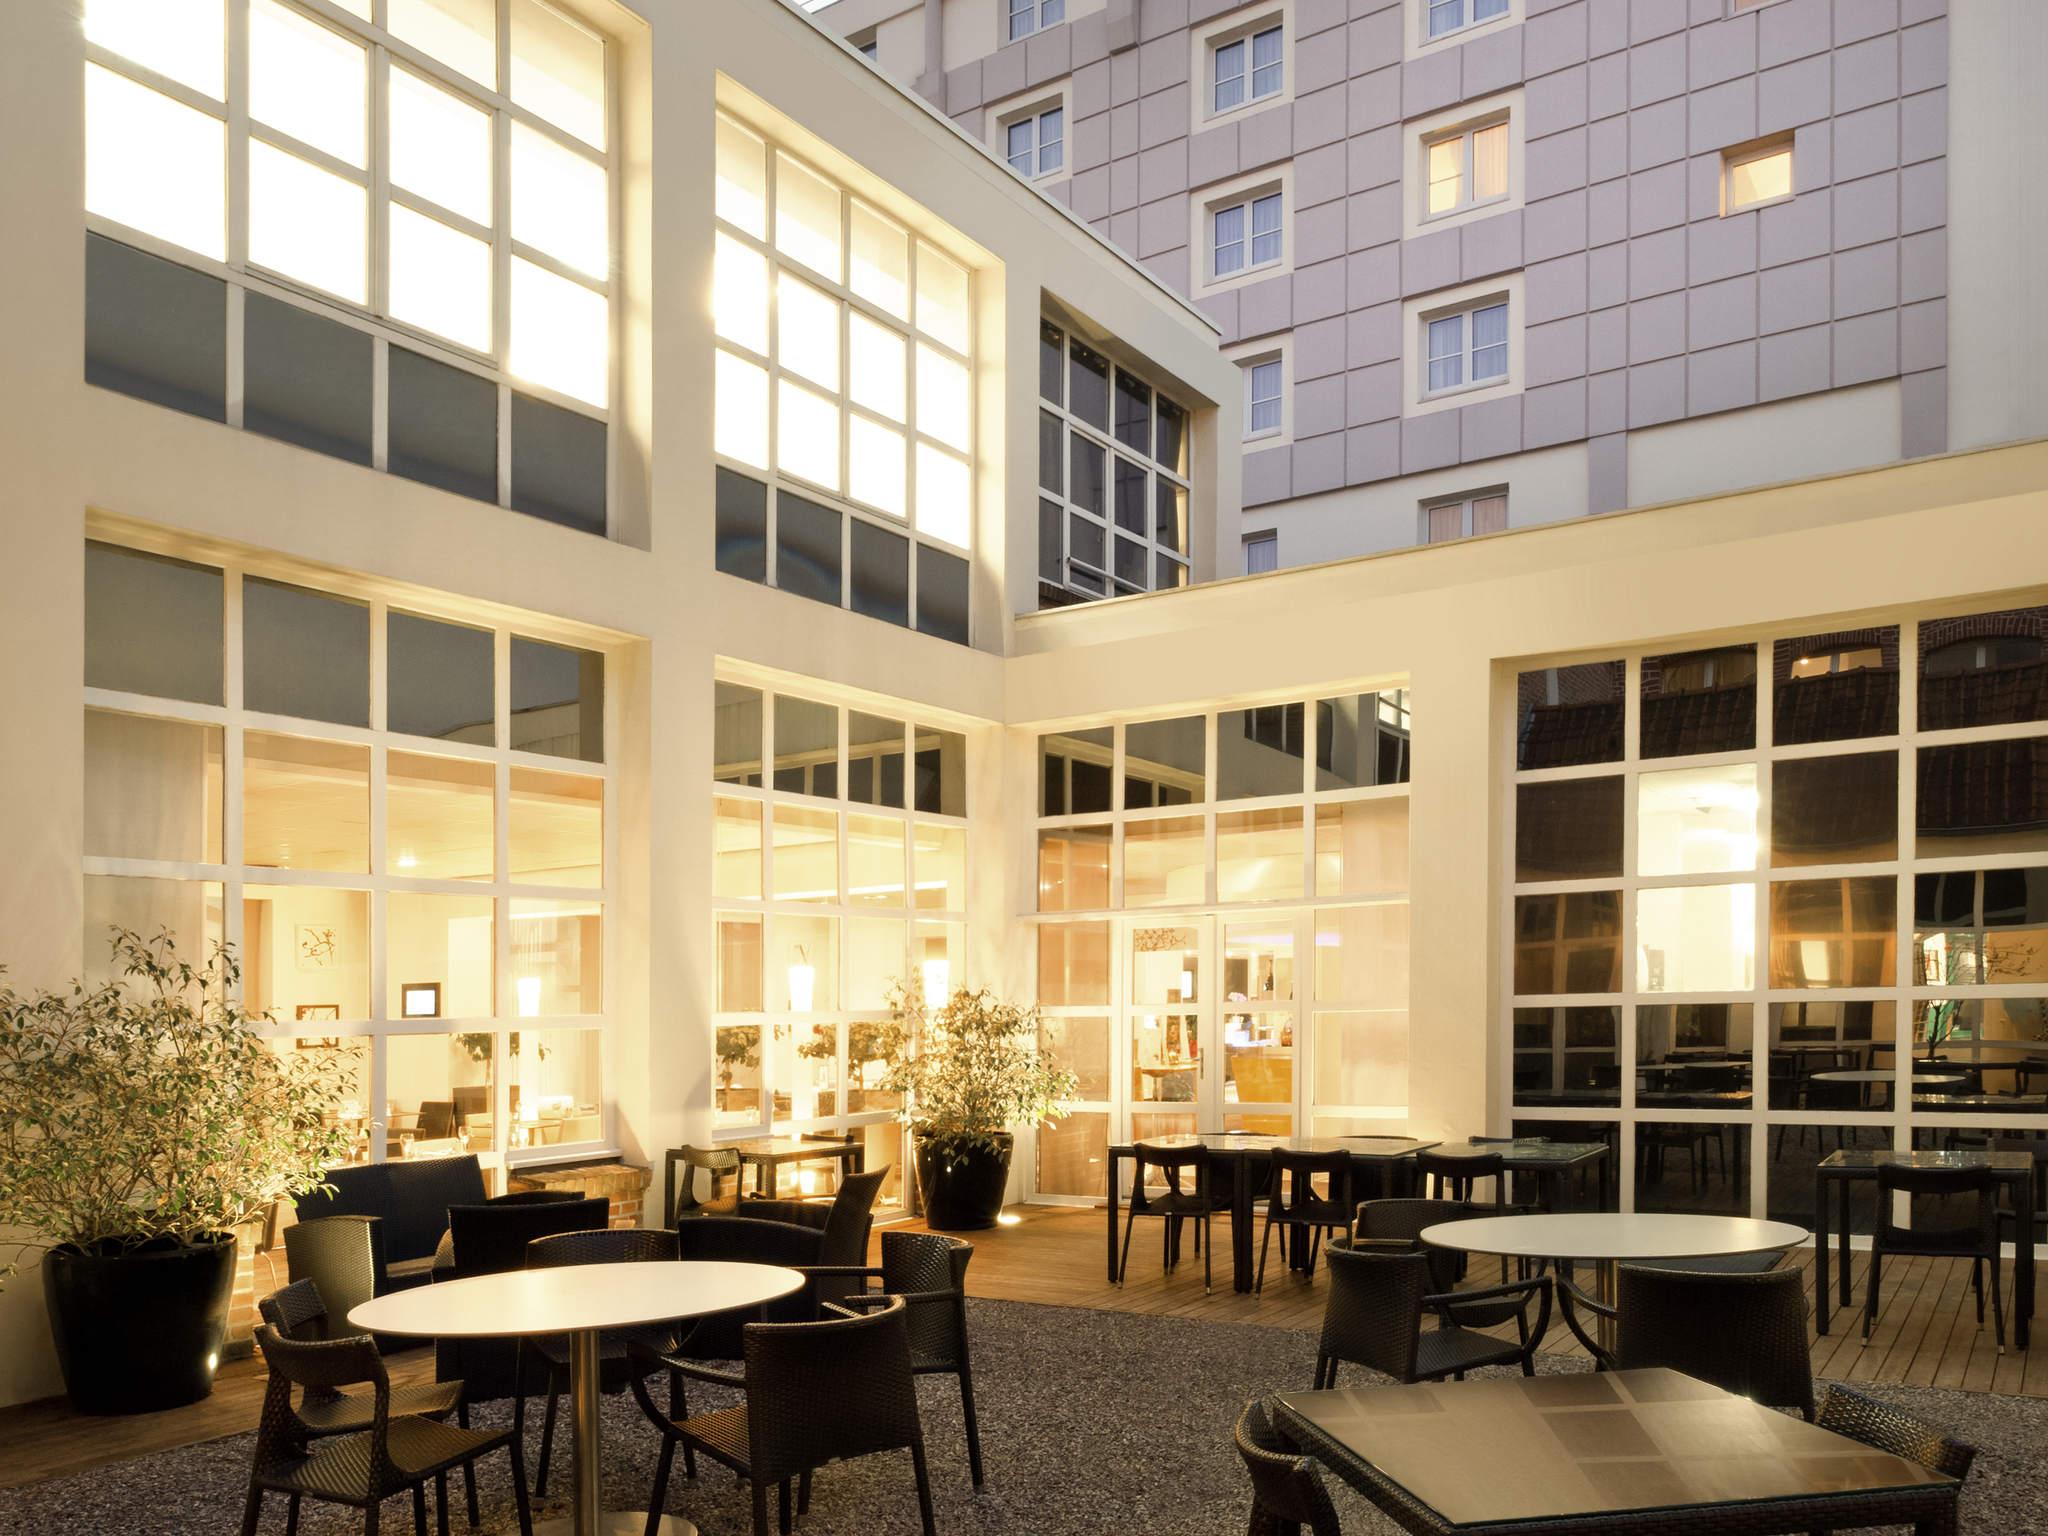 Hotel – Novotel Lille Centre Grand-Place